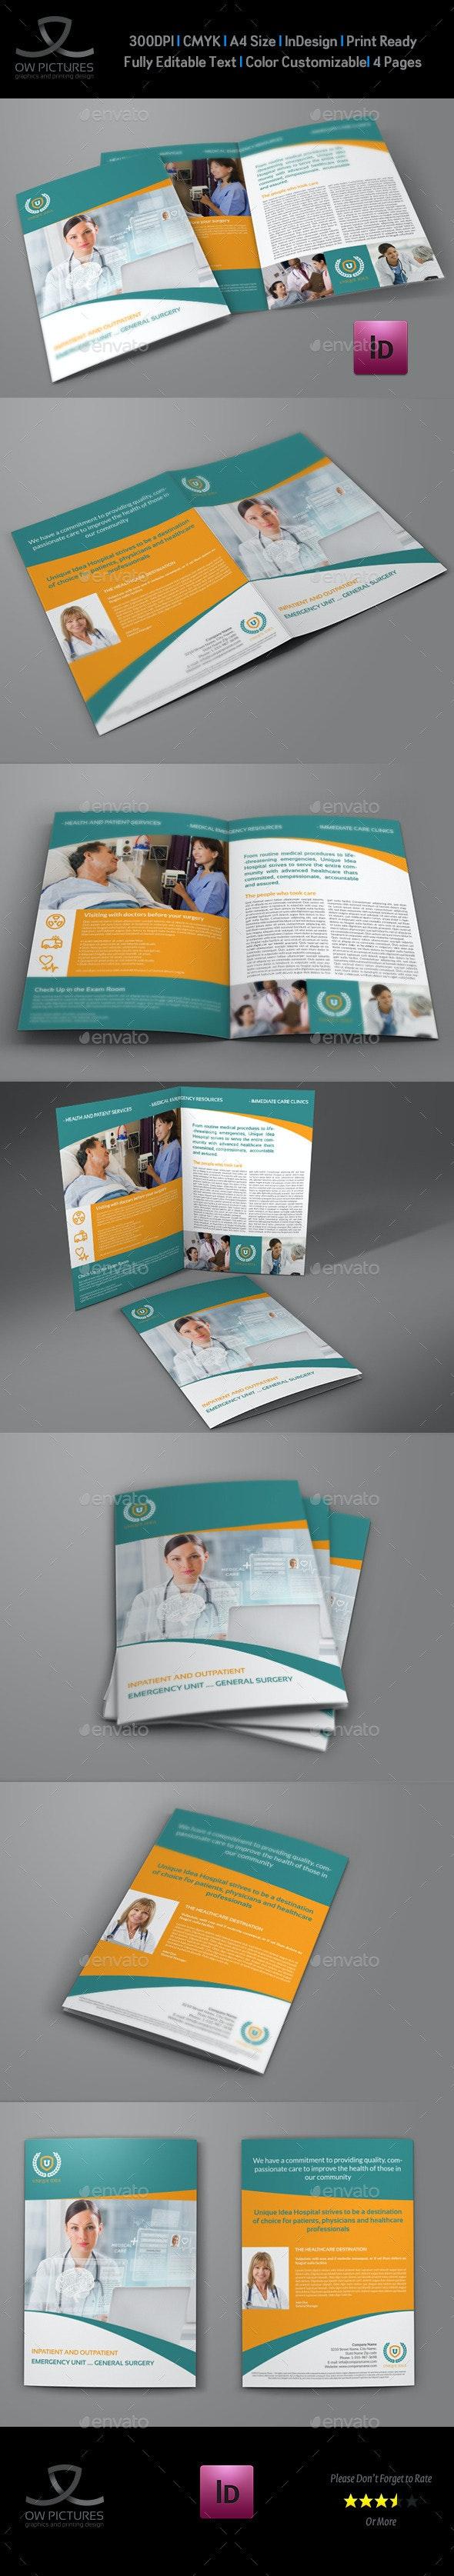 Hospital Bi-Fold Brochure Template Vol.2 - Informational Brochures